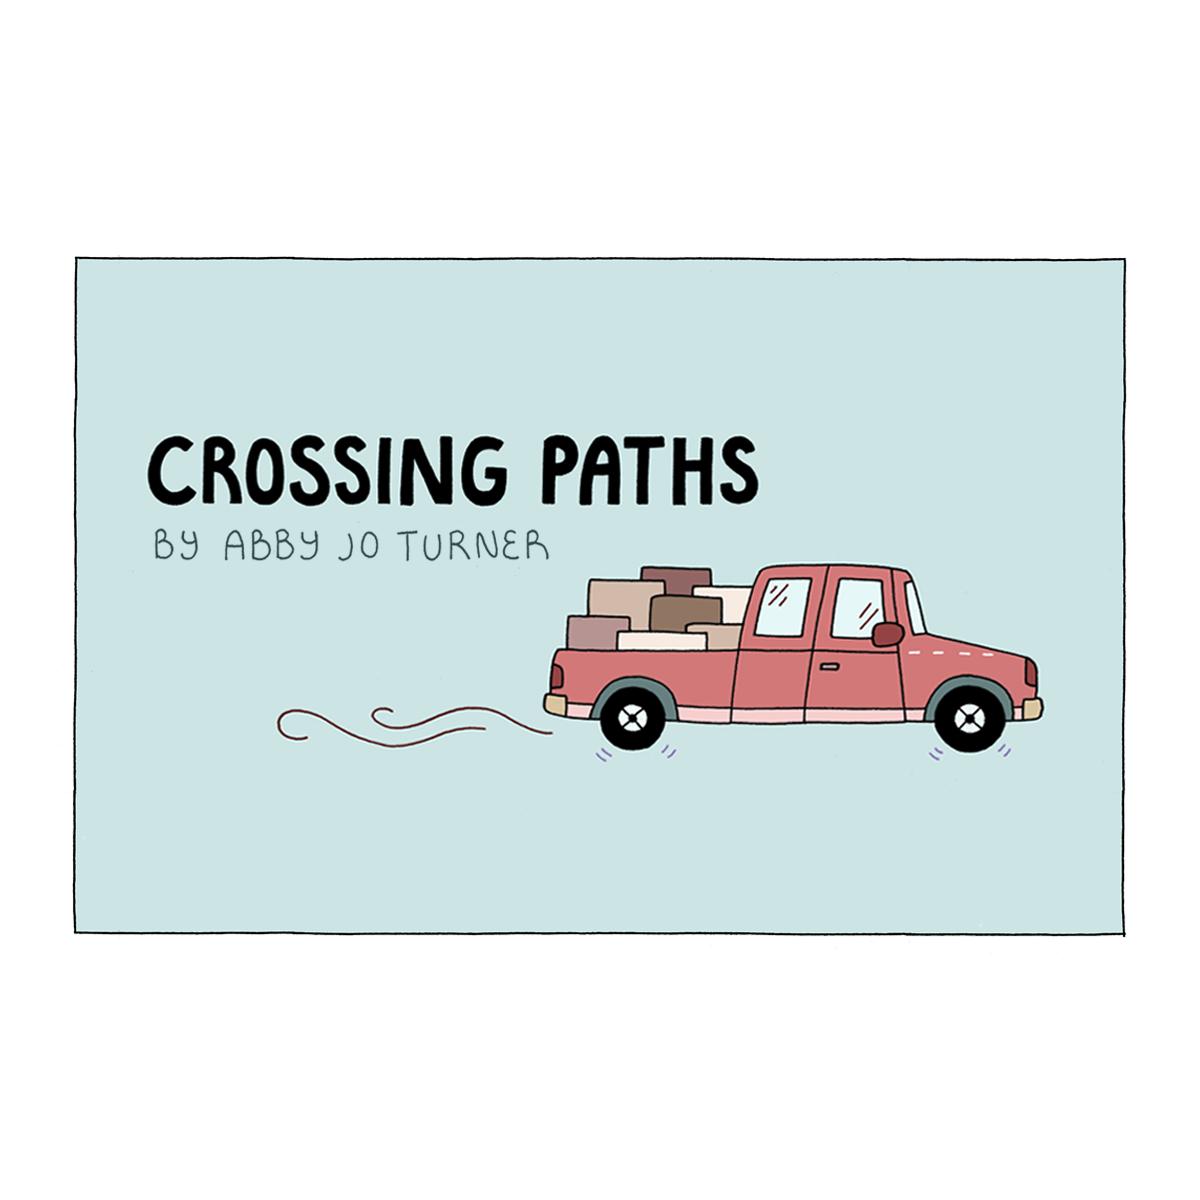 crossingpaths.png